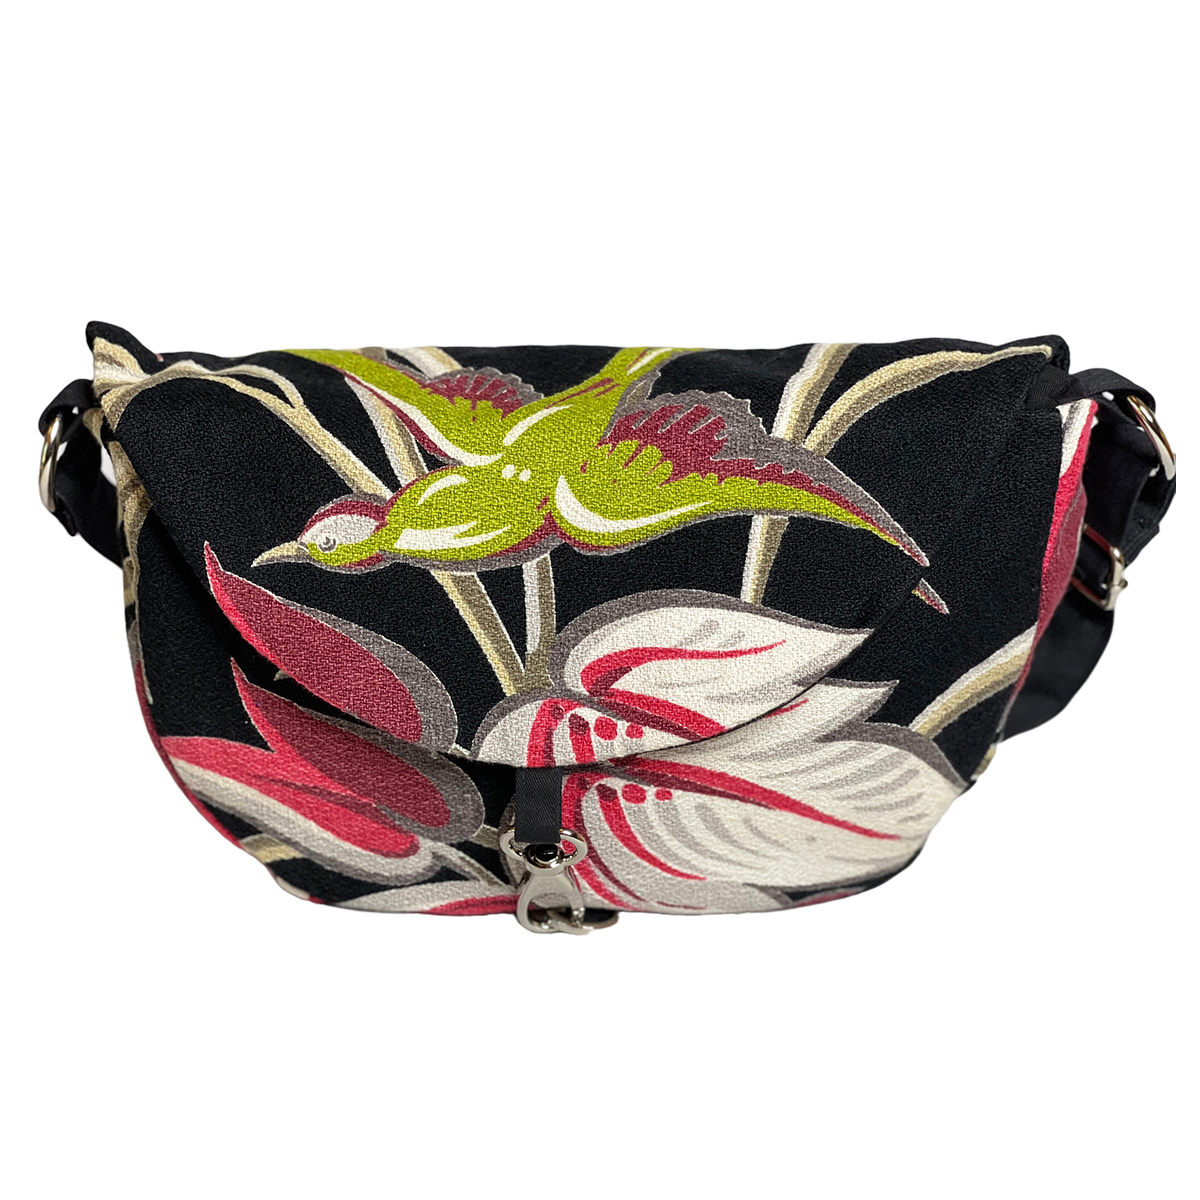 Vogue Bag – Bird in Flight